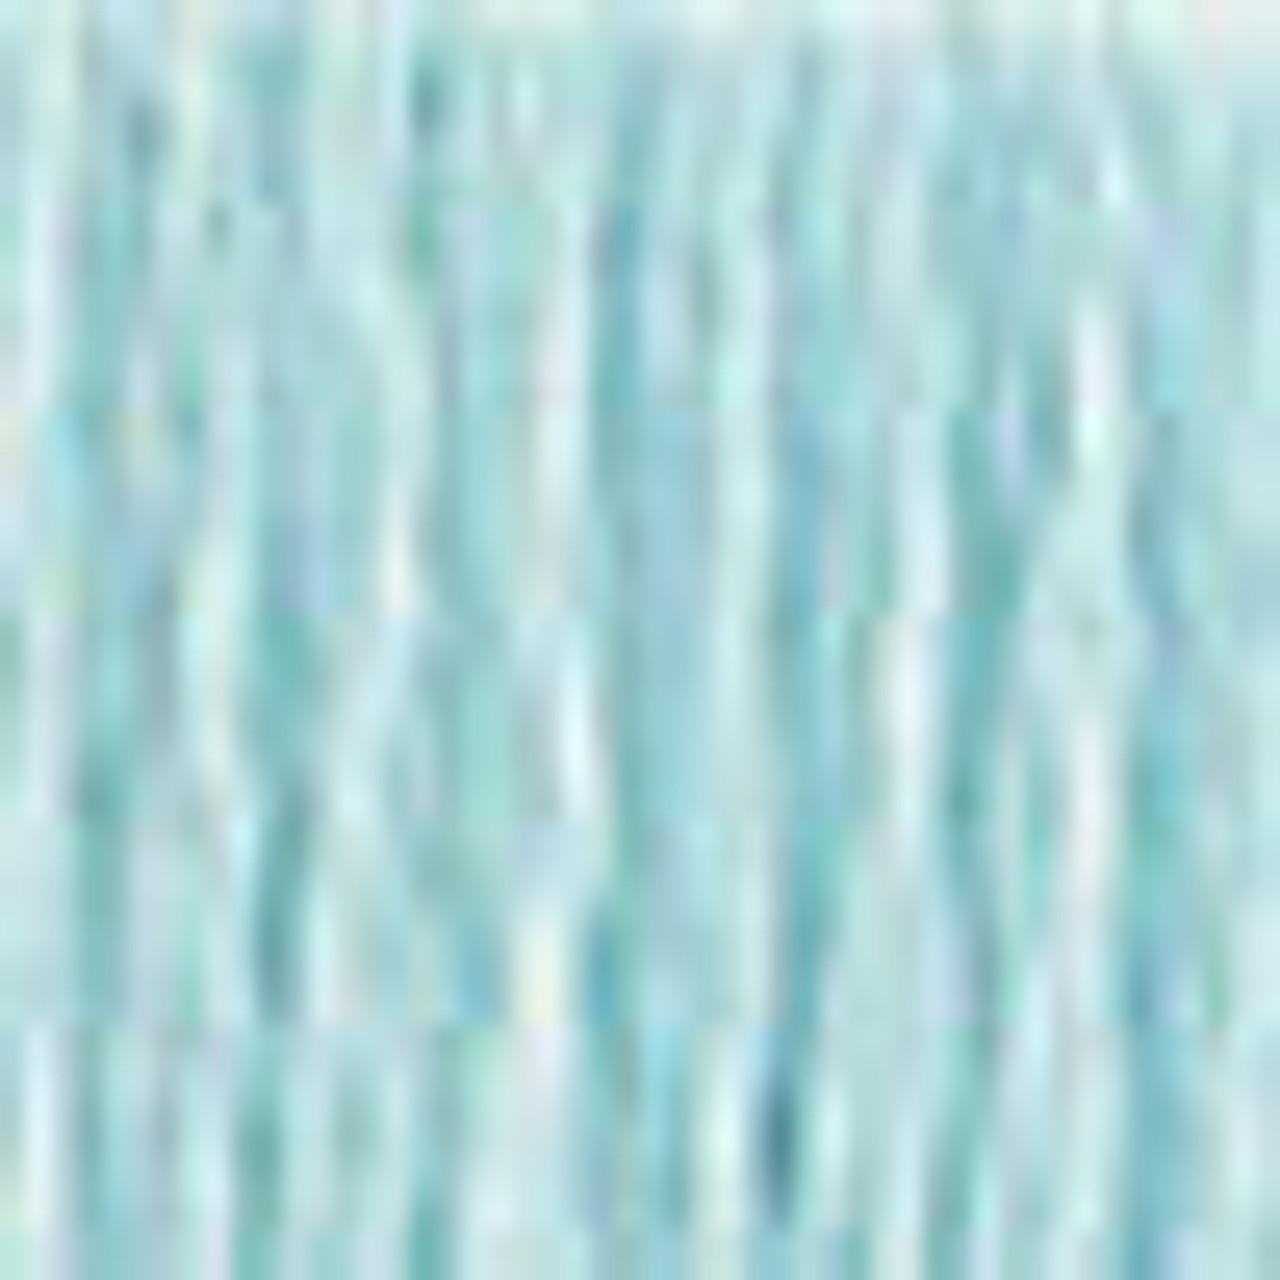 DMC # 3811 Very Light Turquoise Floss / Thread